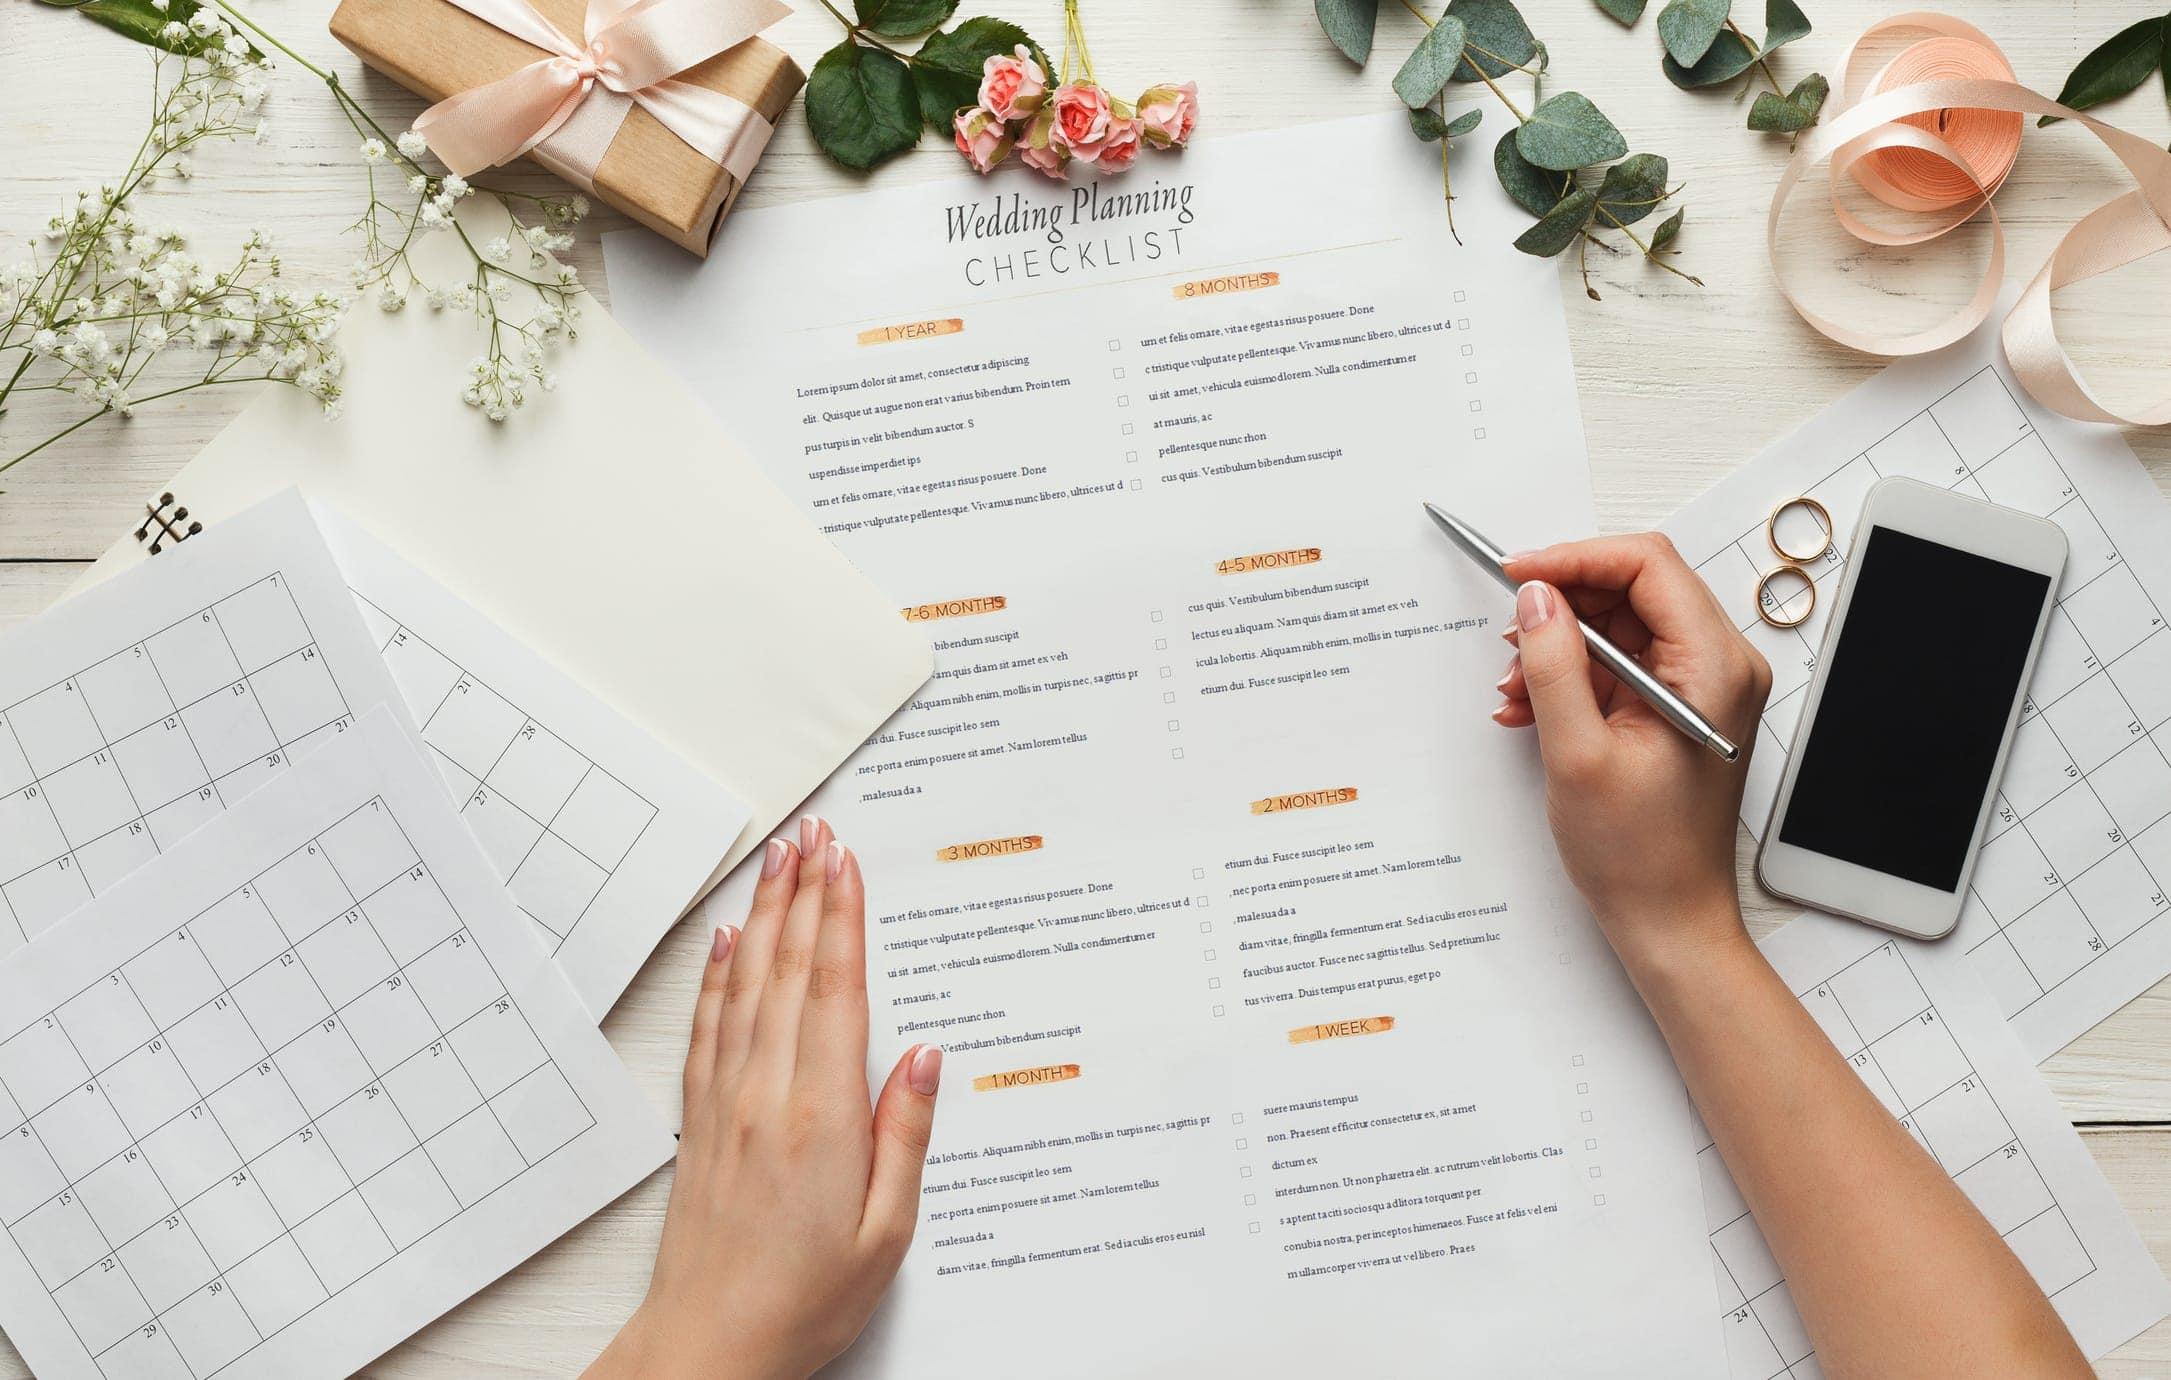 Your 12 month, stress-free wedding planning checklist